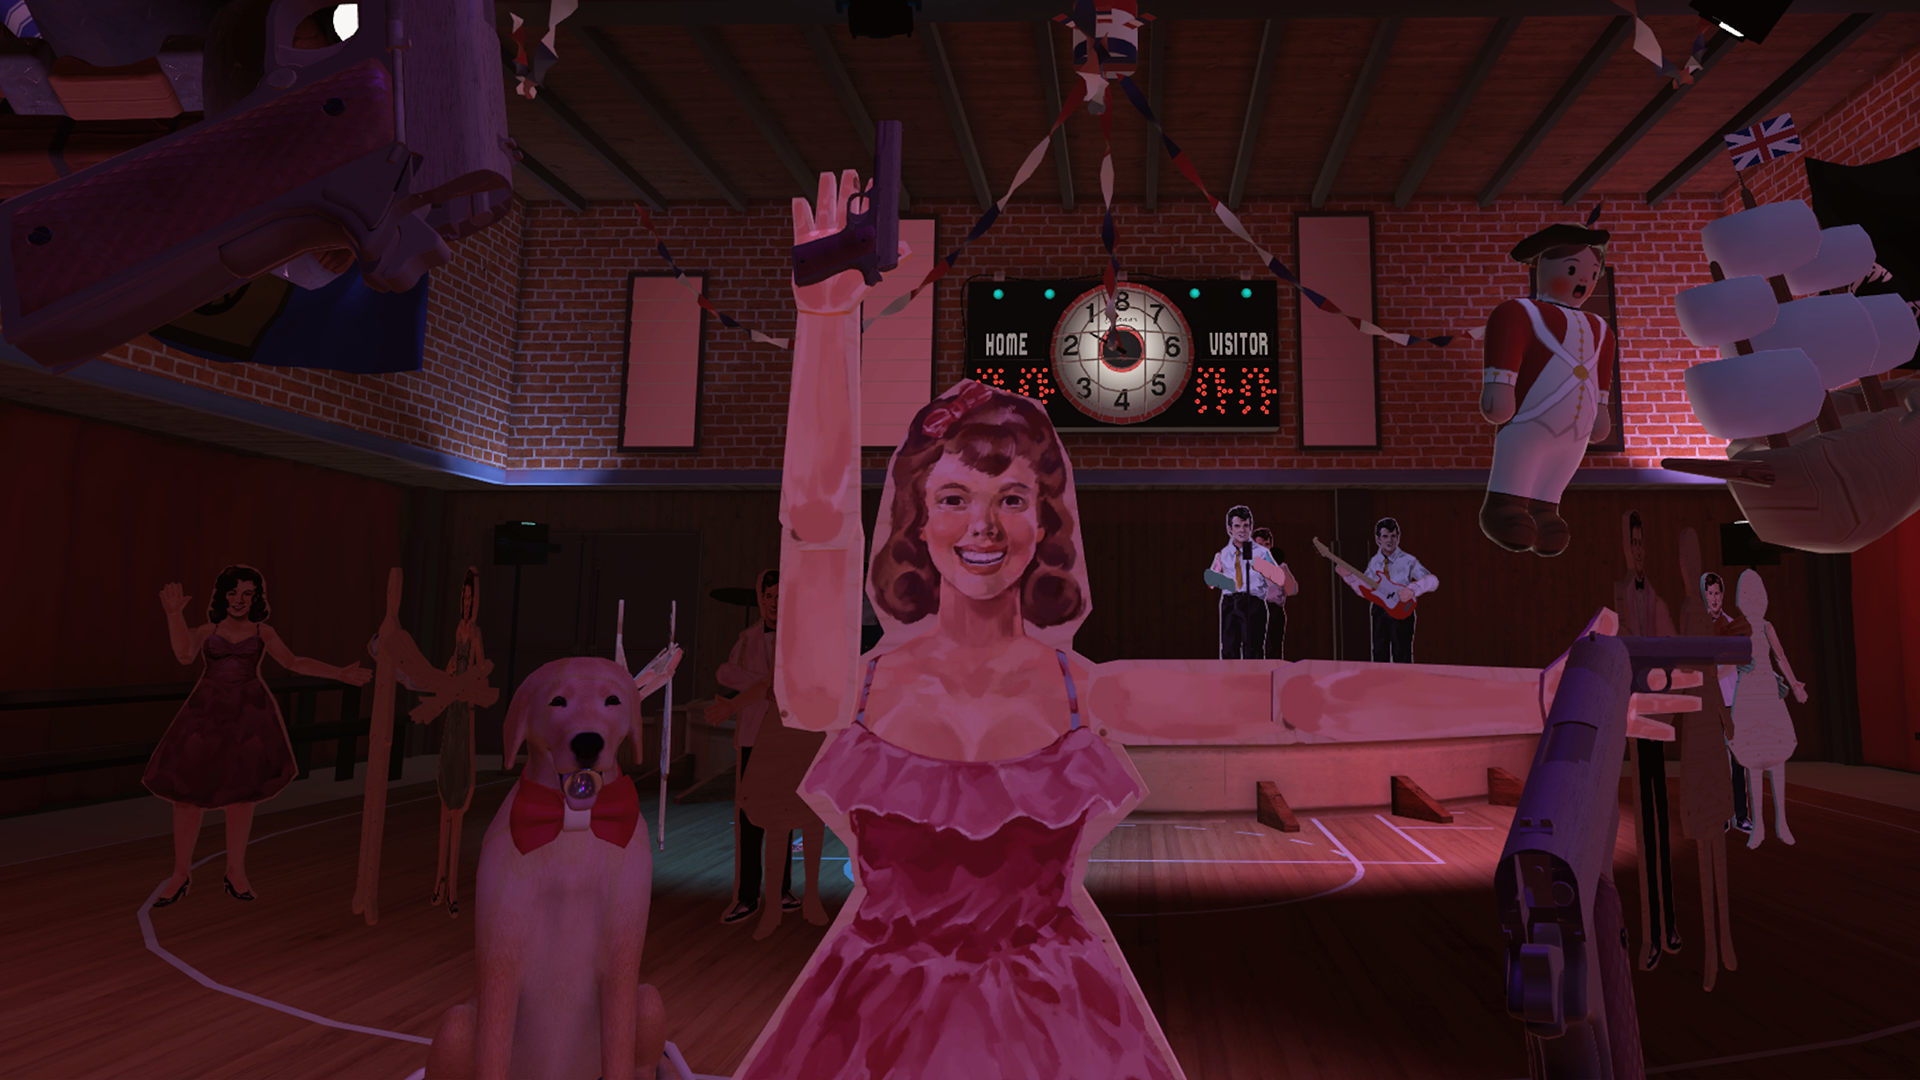 American Dream VR (PS4 VR) - 5